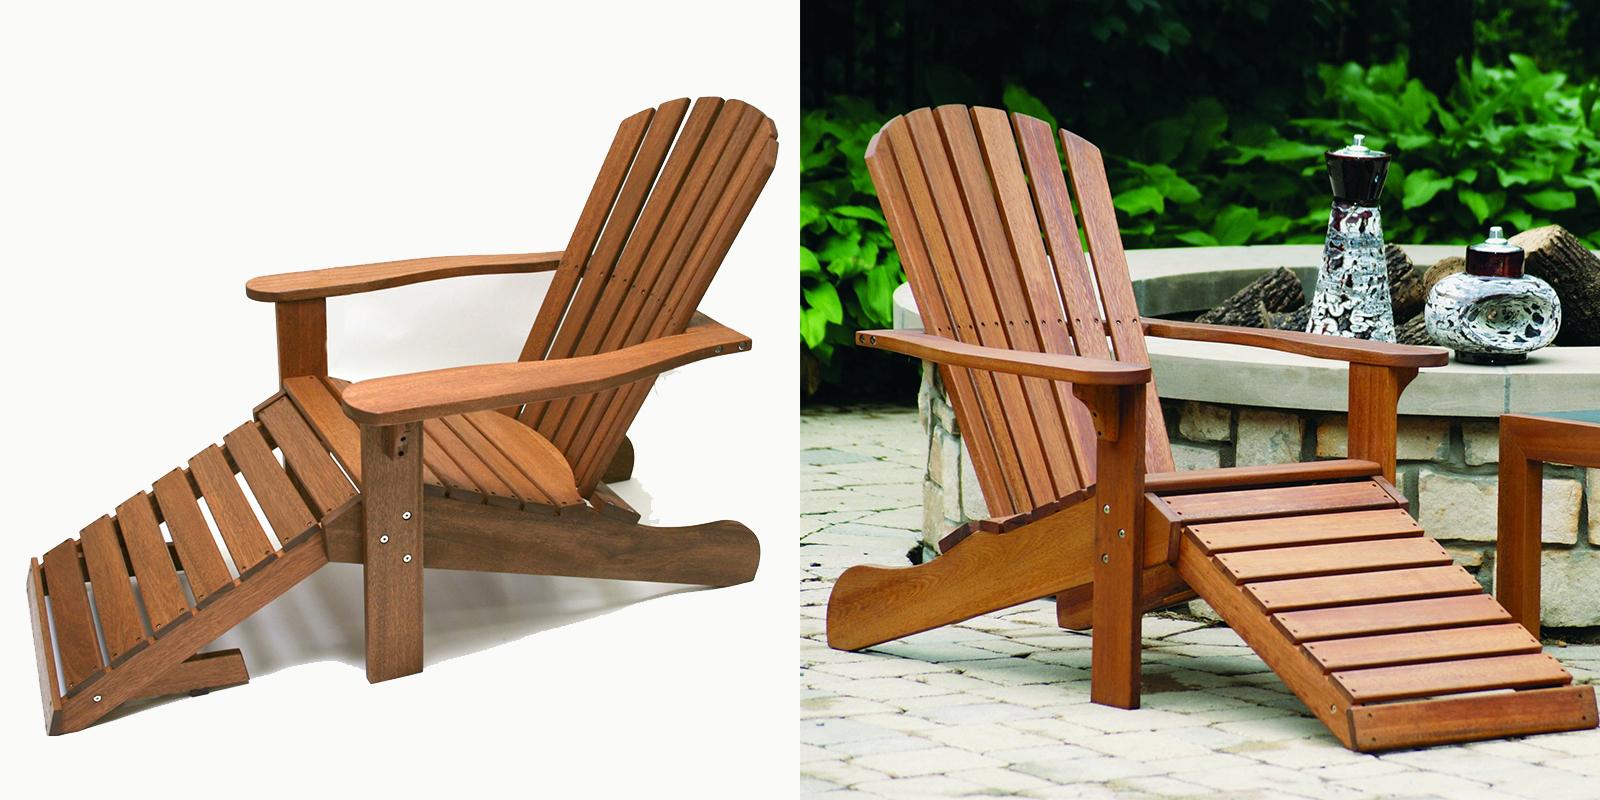 Patio Chair - Eucalyptus Adirondack Chair